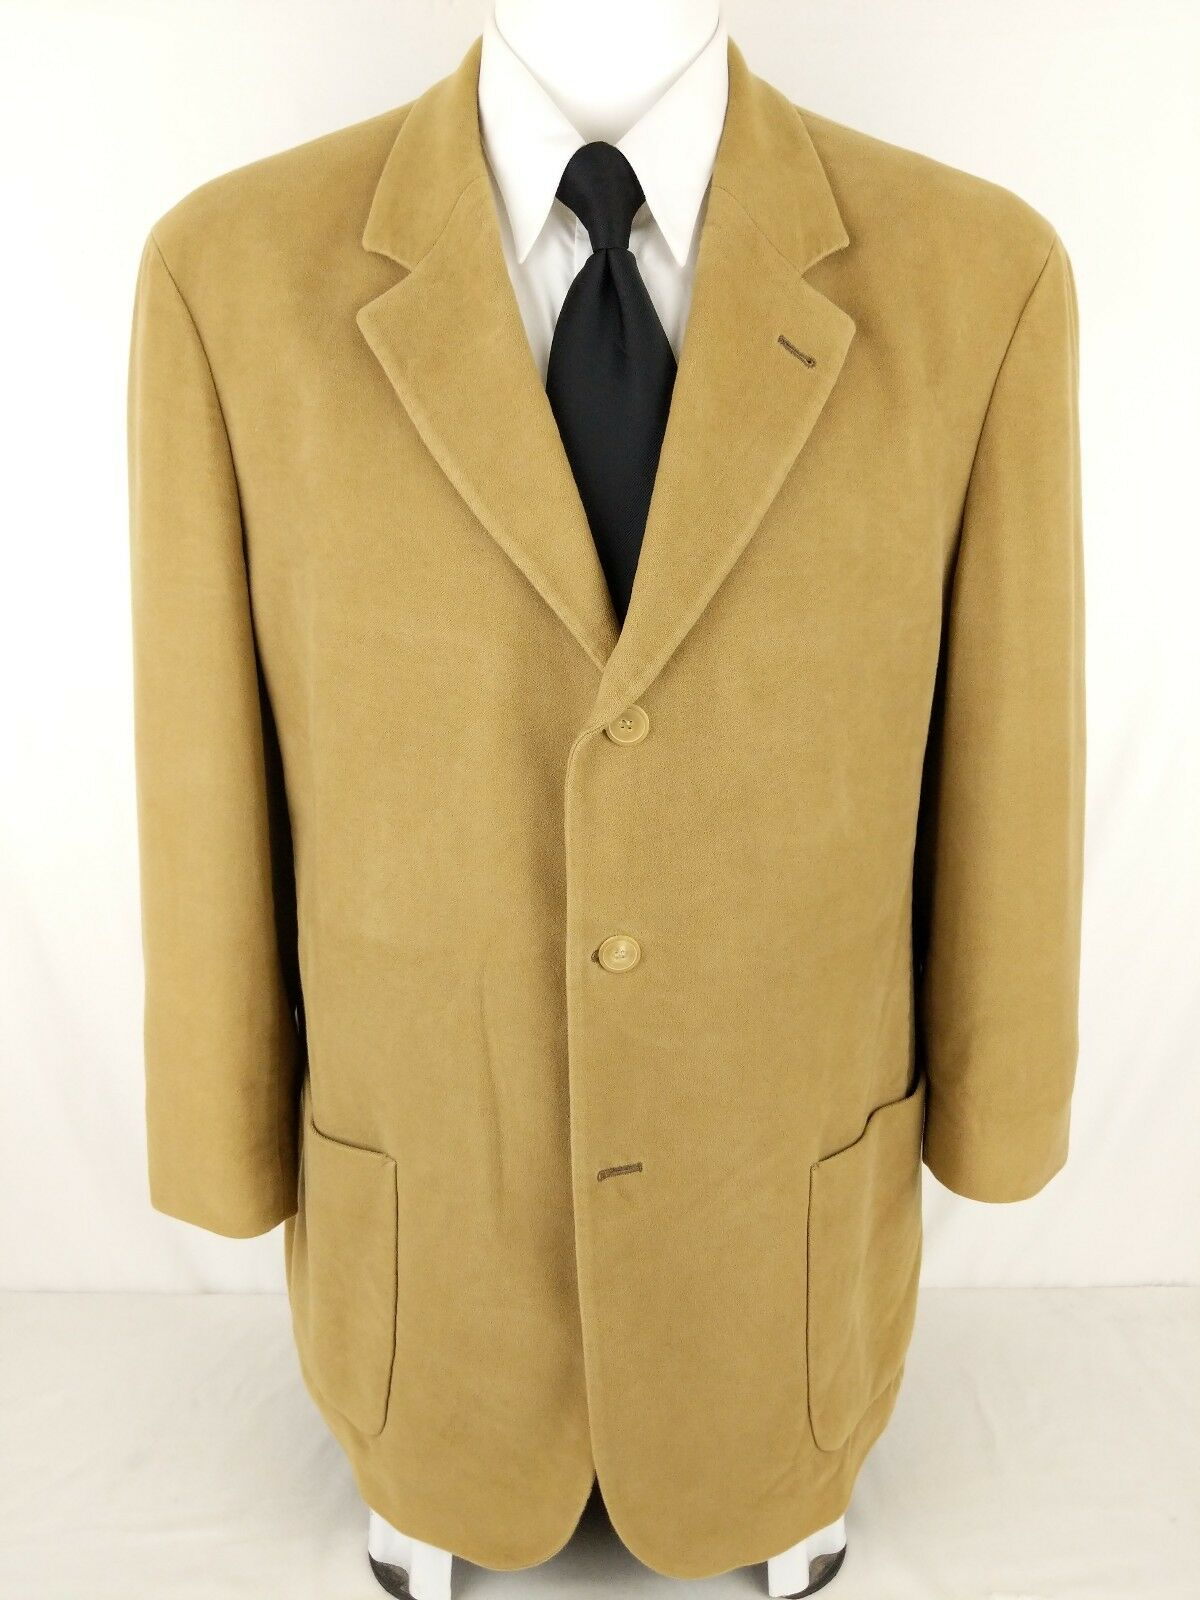 HUGO BOSS SIRRAH 44R Sand Beach Beige Cotton 3 Button Blazer SAKS FIFTH AVE Coat